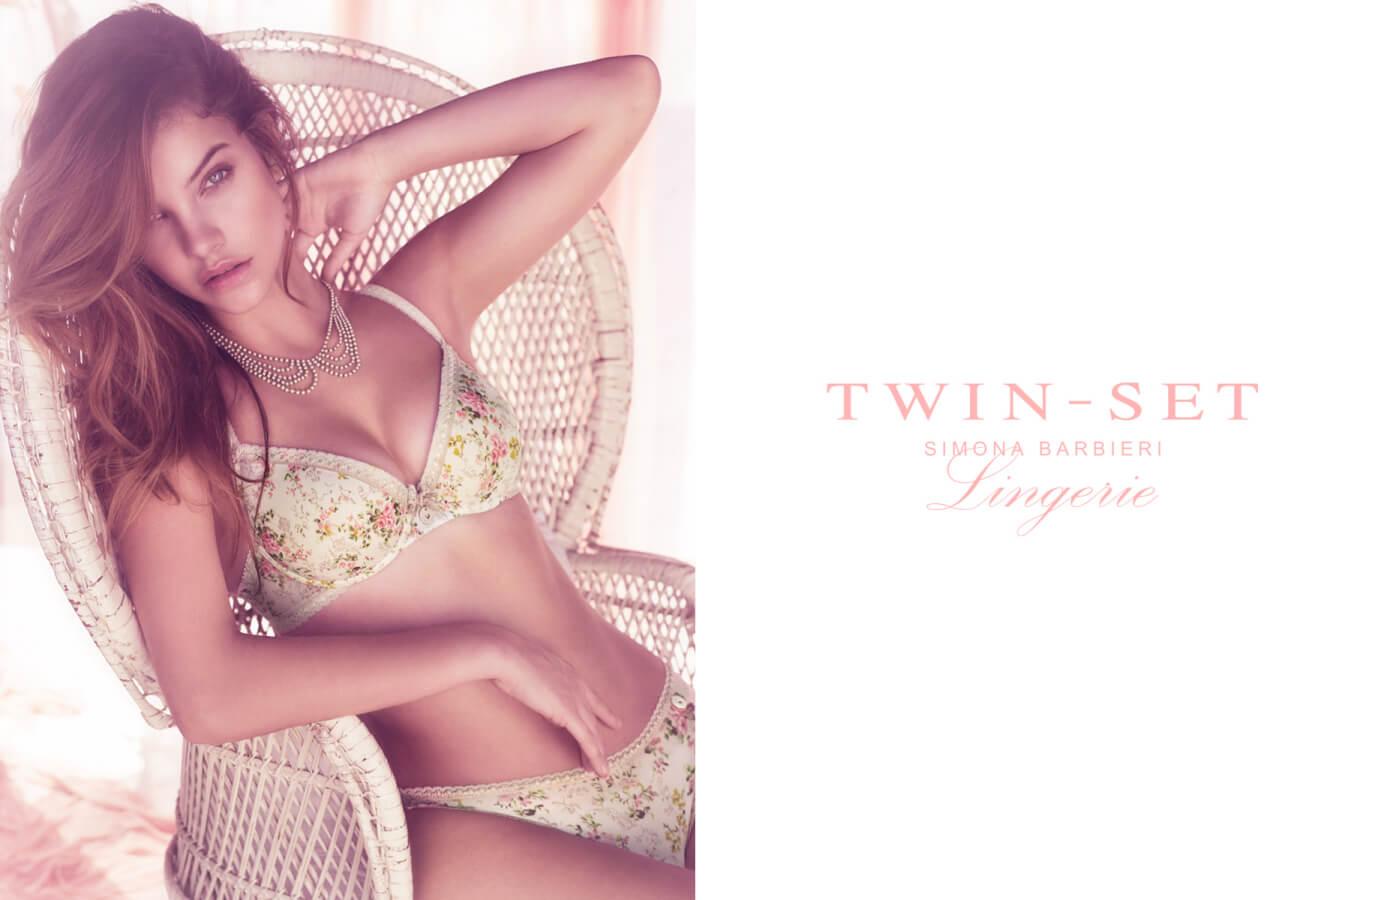 02_Alvaro_Beamud_Cortes_Twin Set_Lingerie 2014